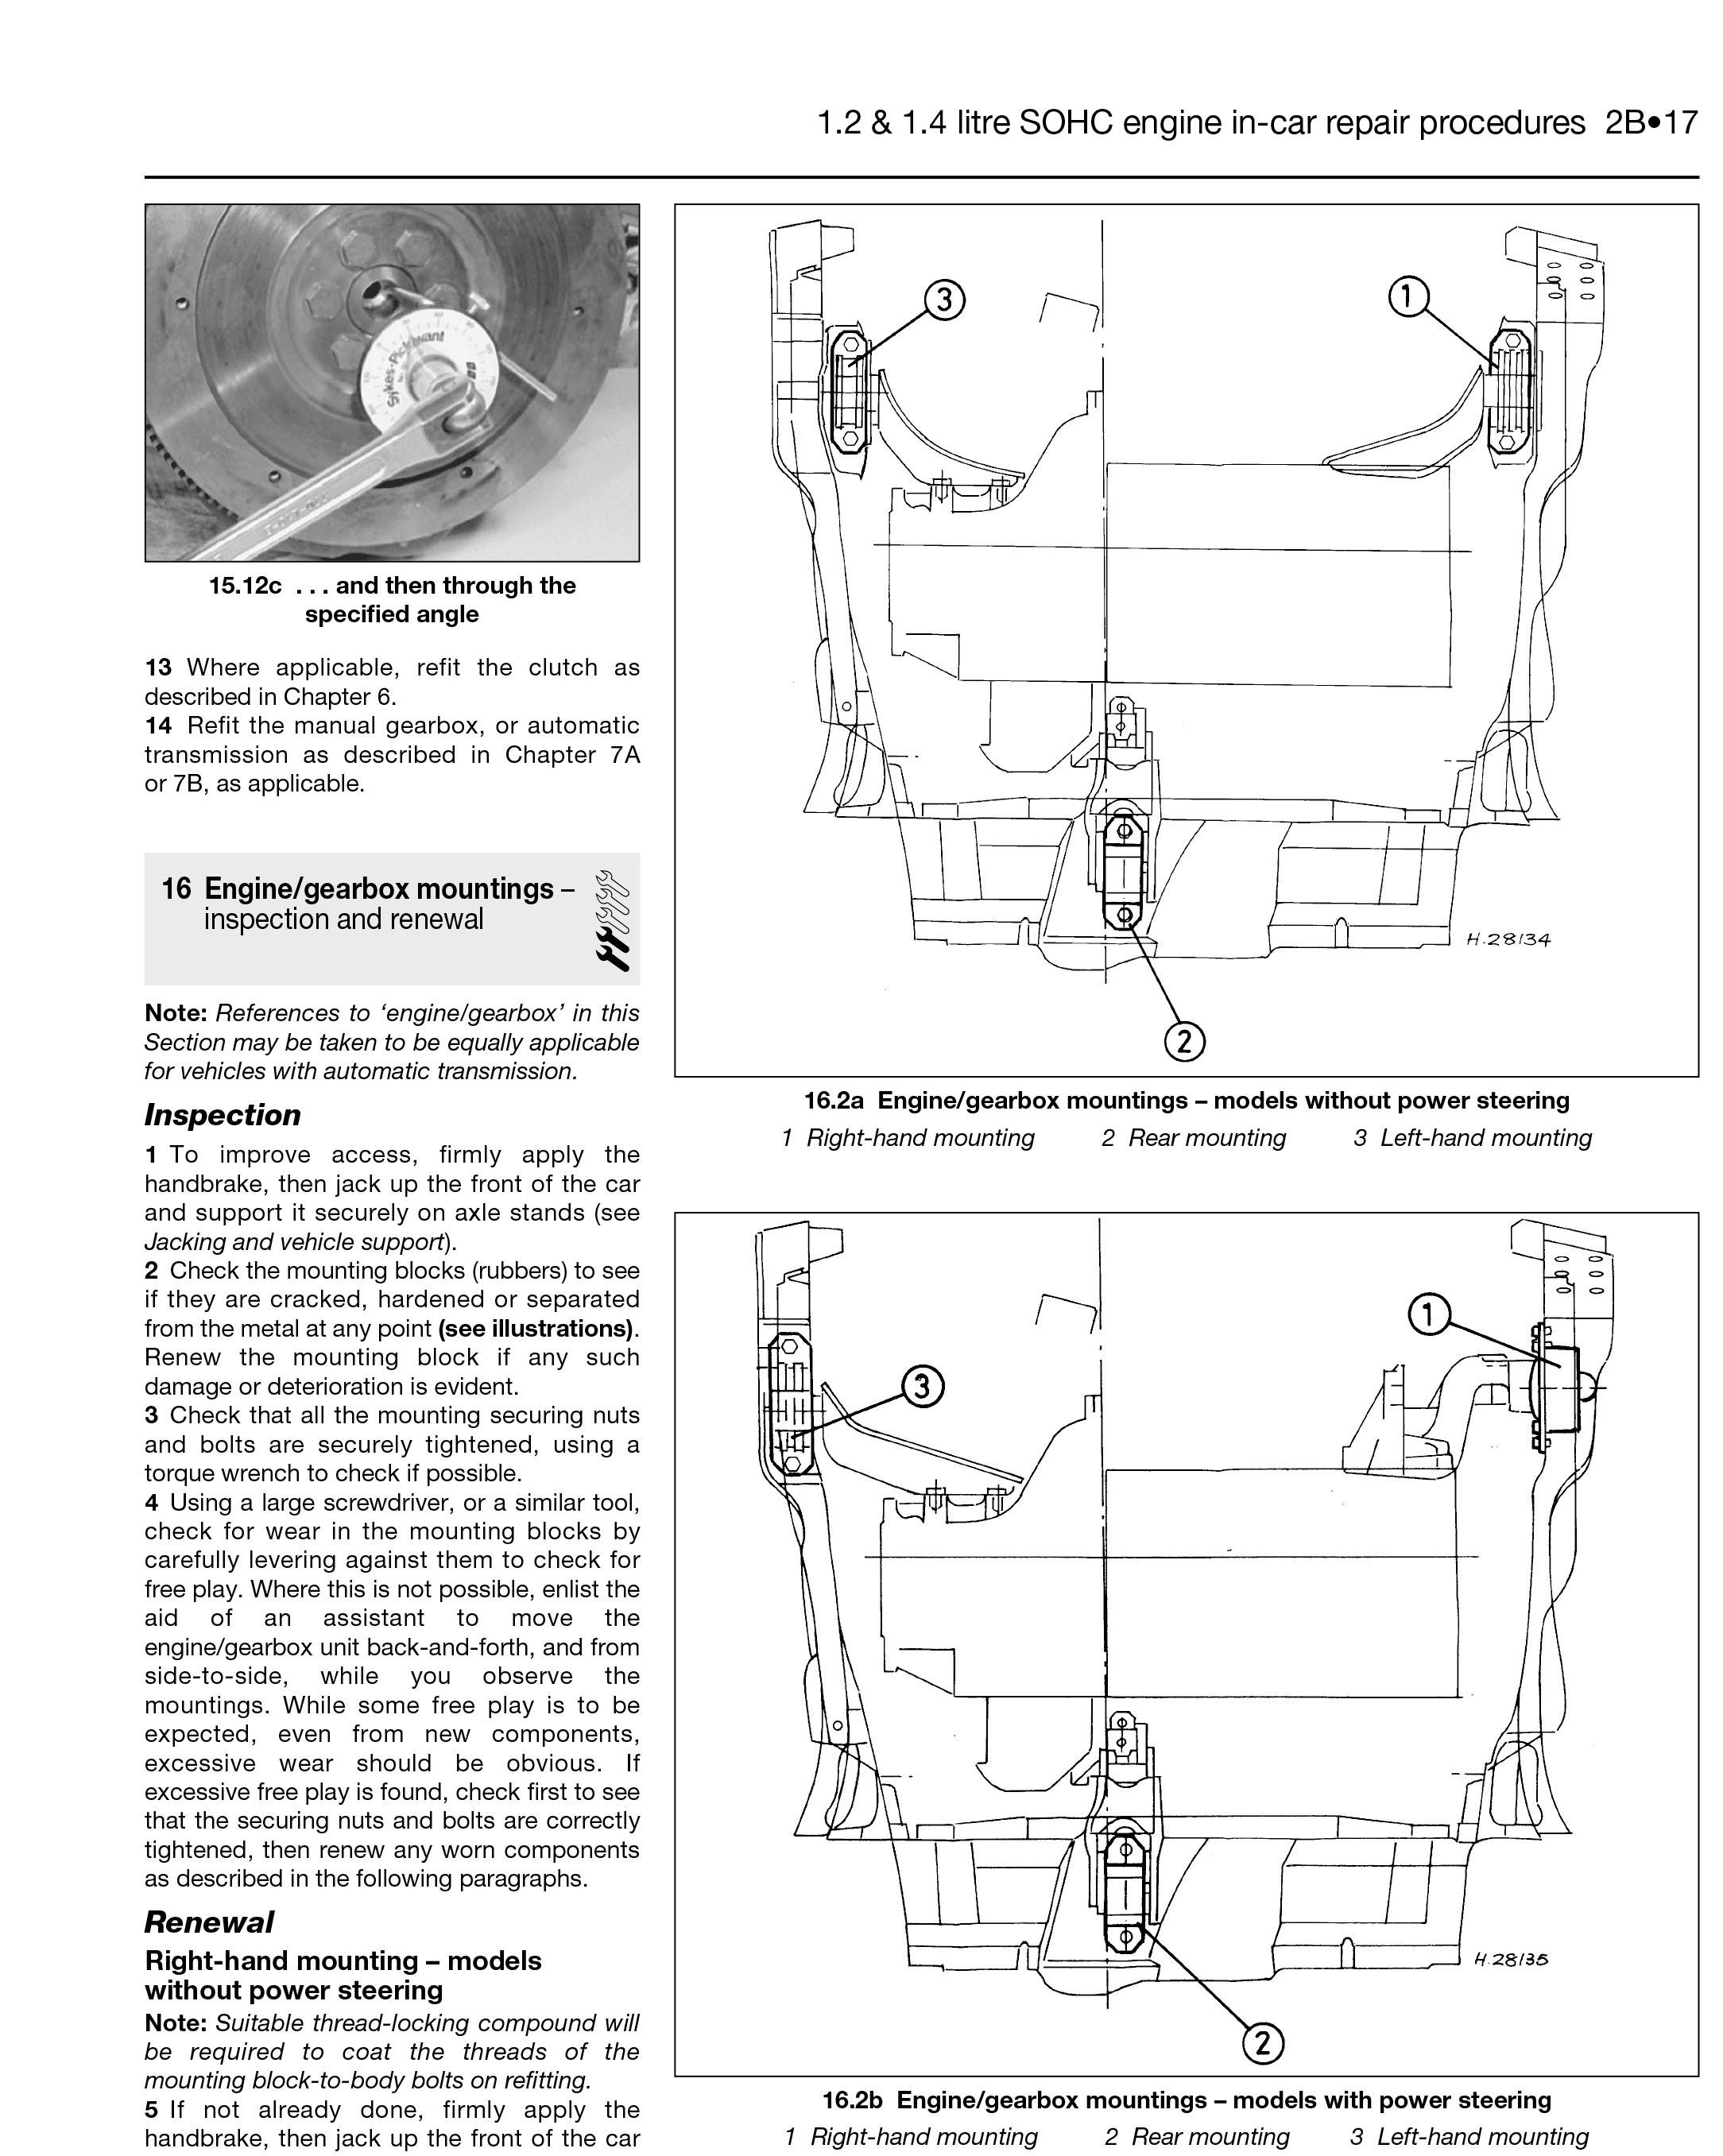 corsa b engine diagram house wiring diagram symbols u2022 rh maxturner co vauxhall astra engine diagram vauxhall insignia engine diagram